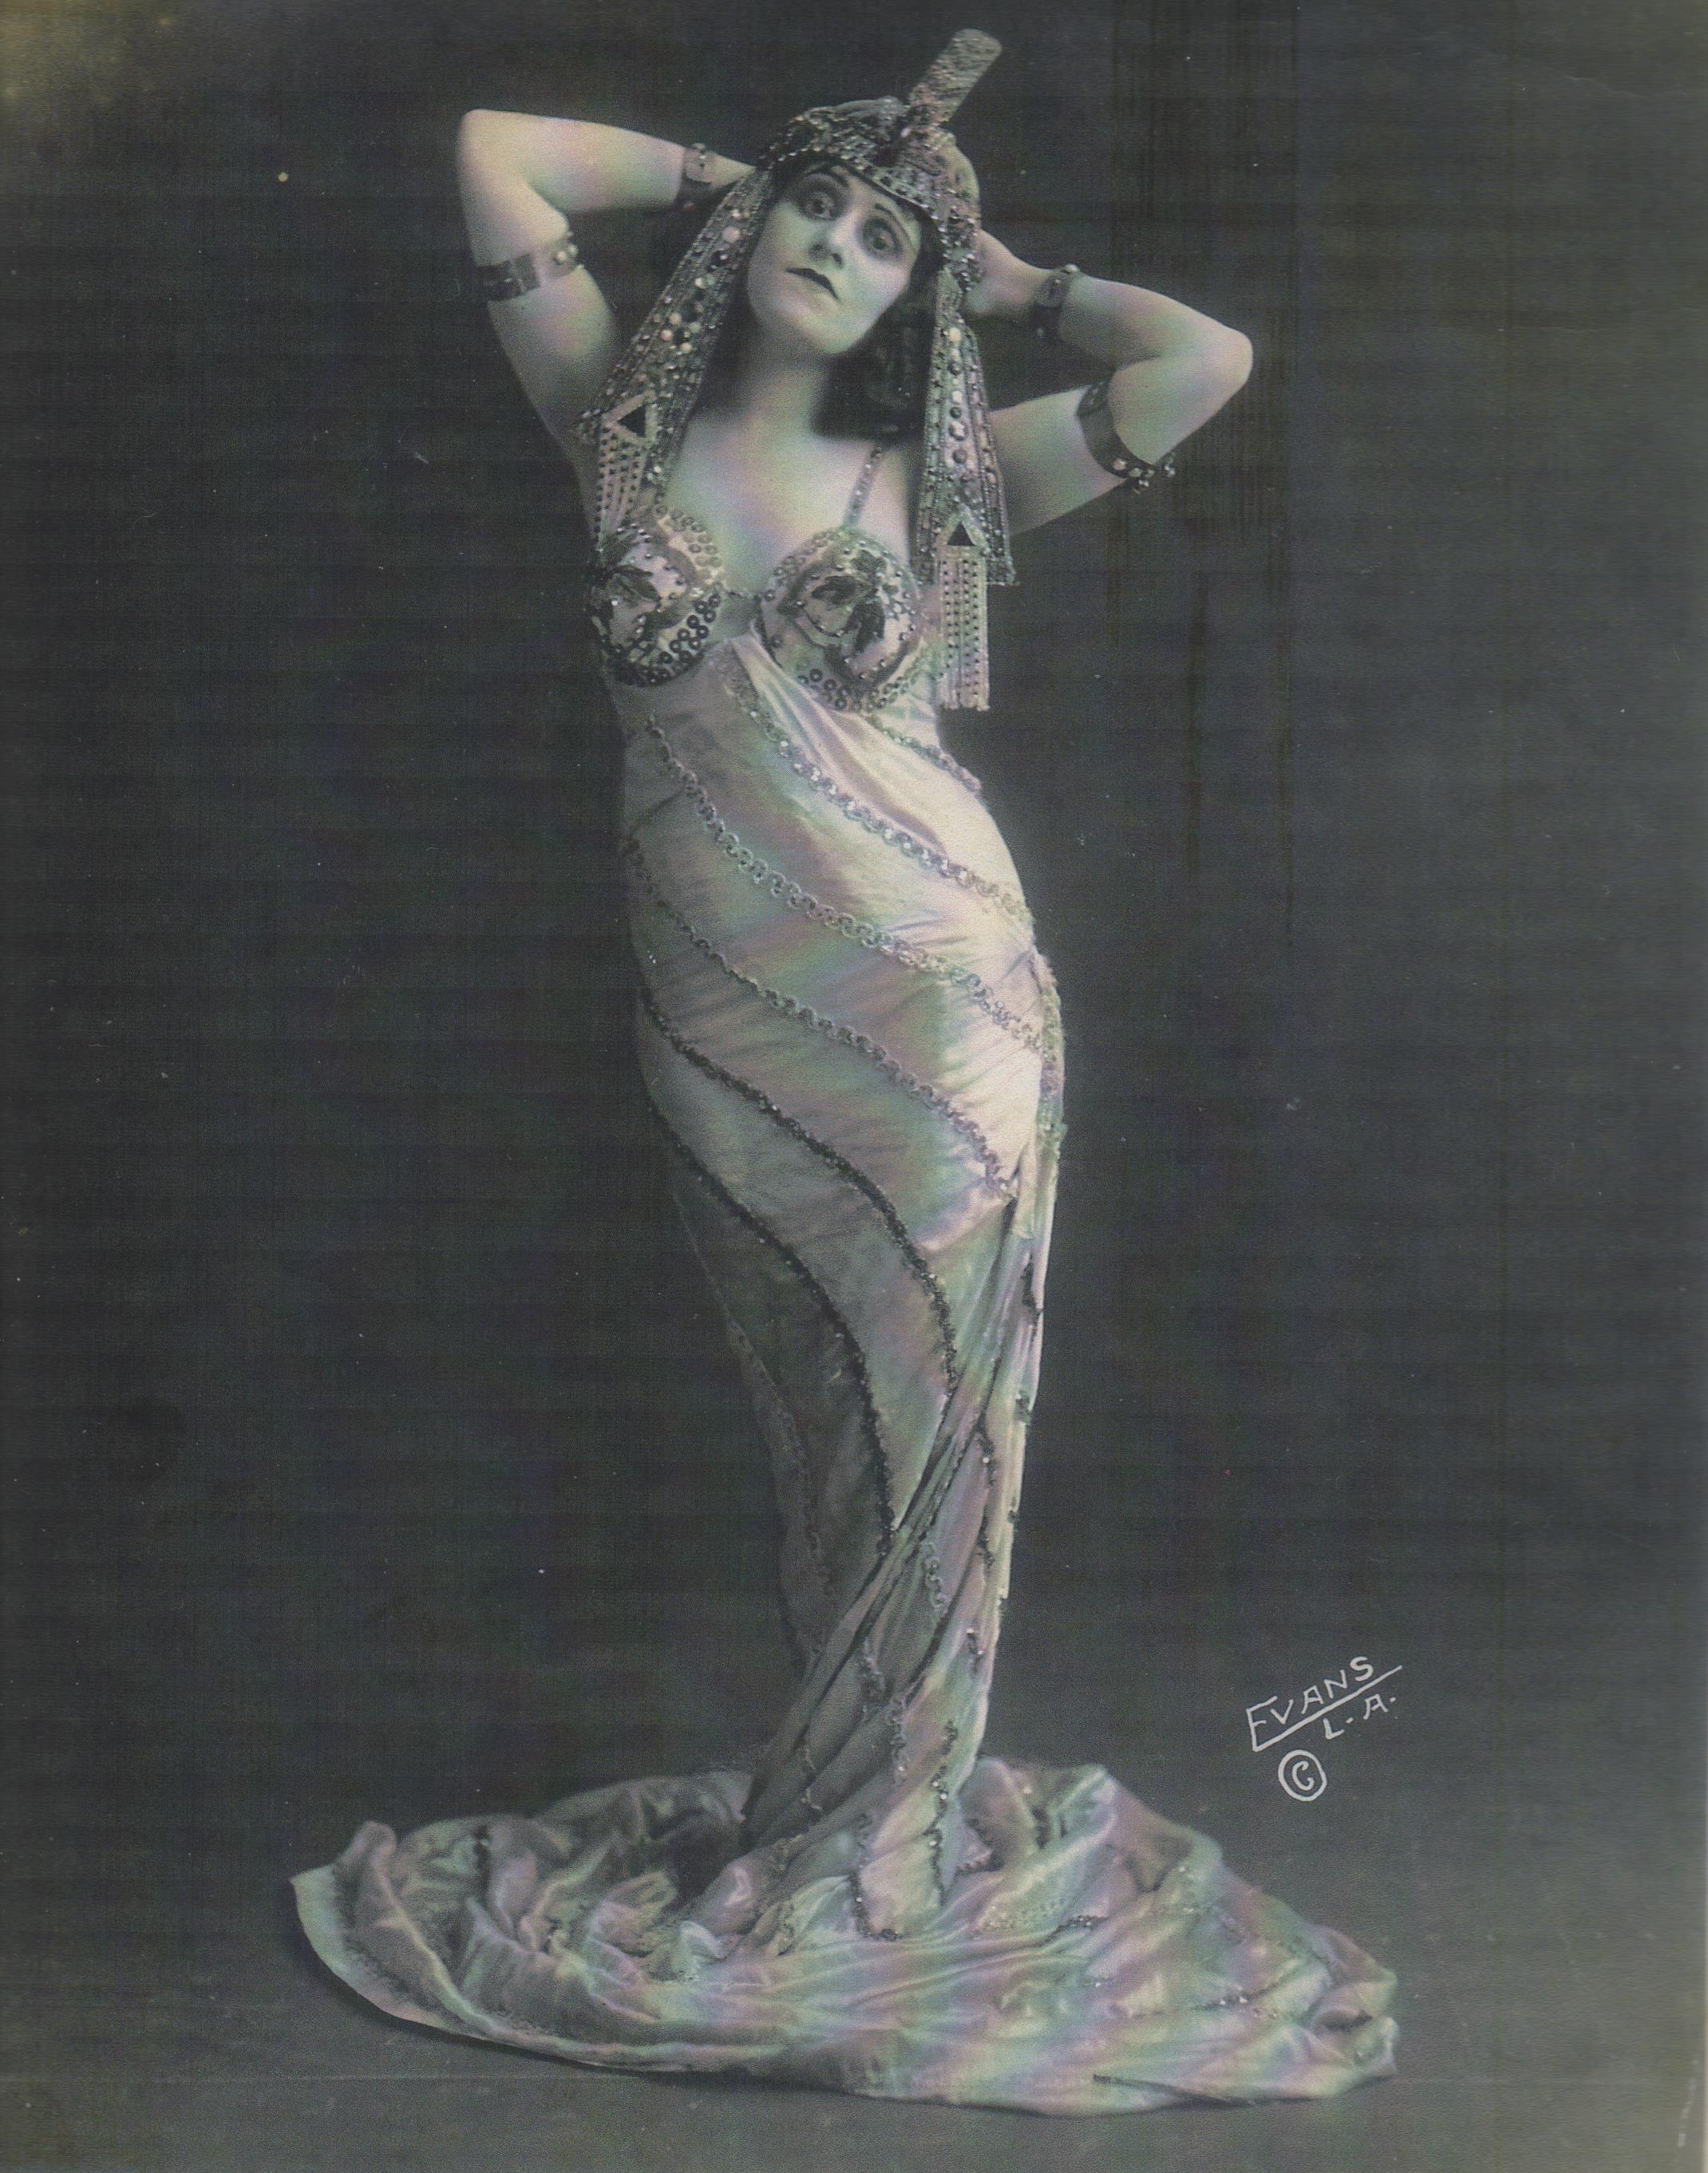 Angelica Panganiban (b. 1986)